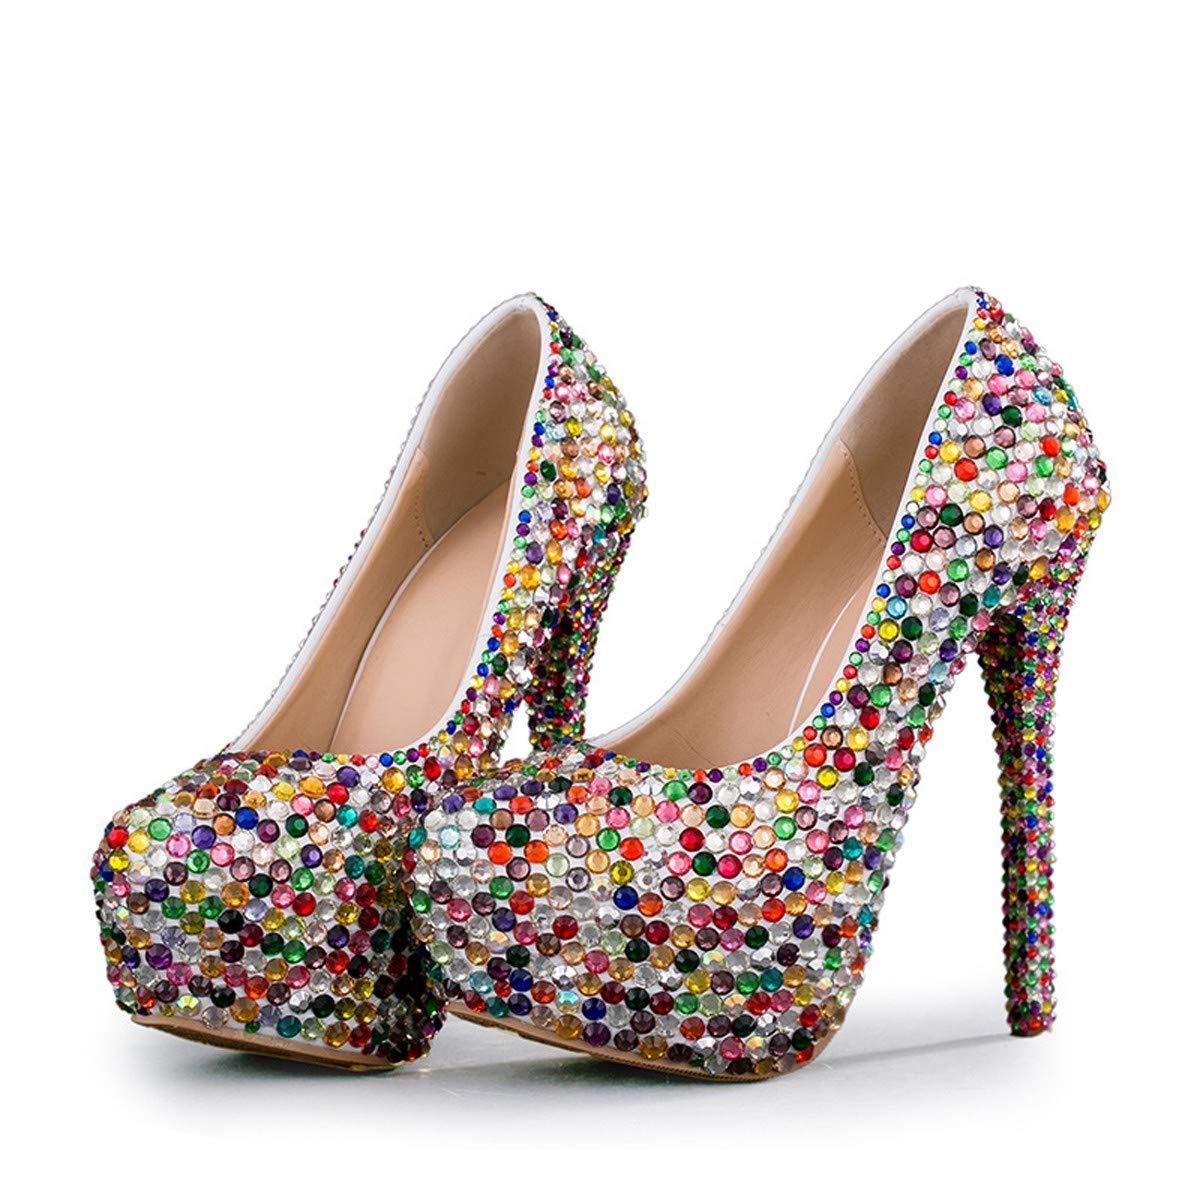 KPHY Damenschuhe/Diamant - Hochzeit - 14 cm Schuhe Schuhe Farbe Crash - Bohrer Hochzeit Schuhe Performance